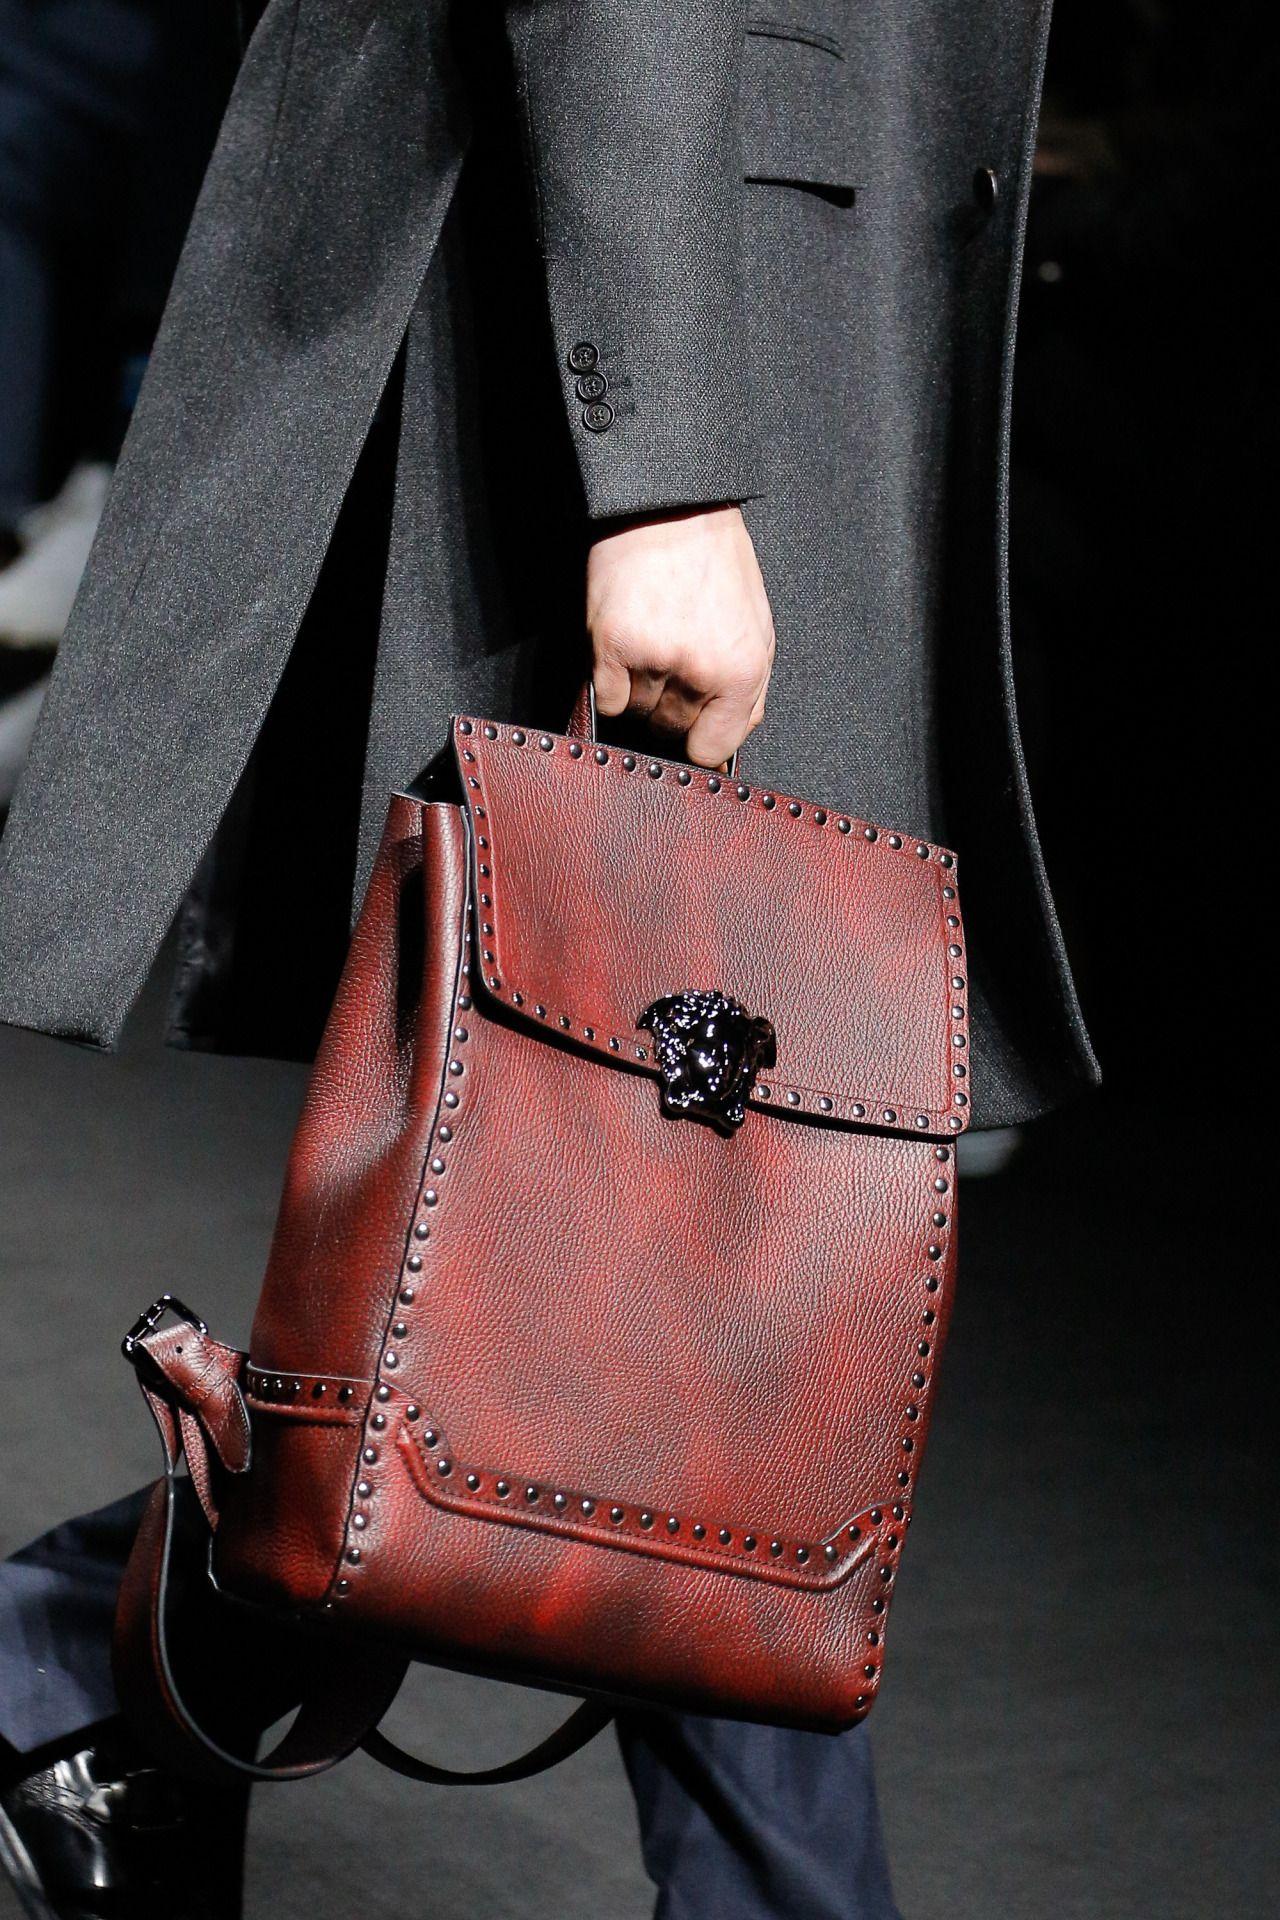 dd5e10c645bf Versace menswear papa got a brand new bag pinterest jpg 1280x1920 Leather versace  bags 2017